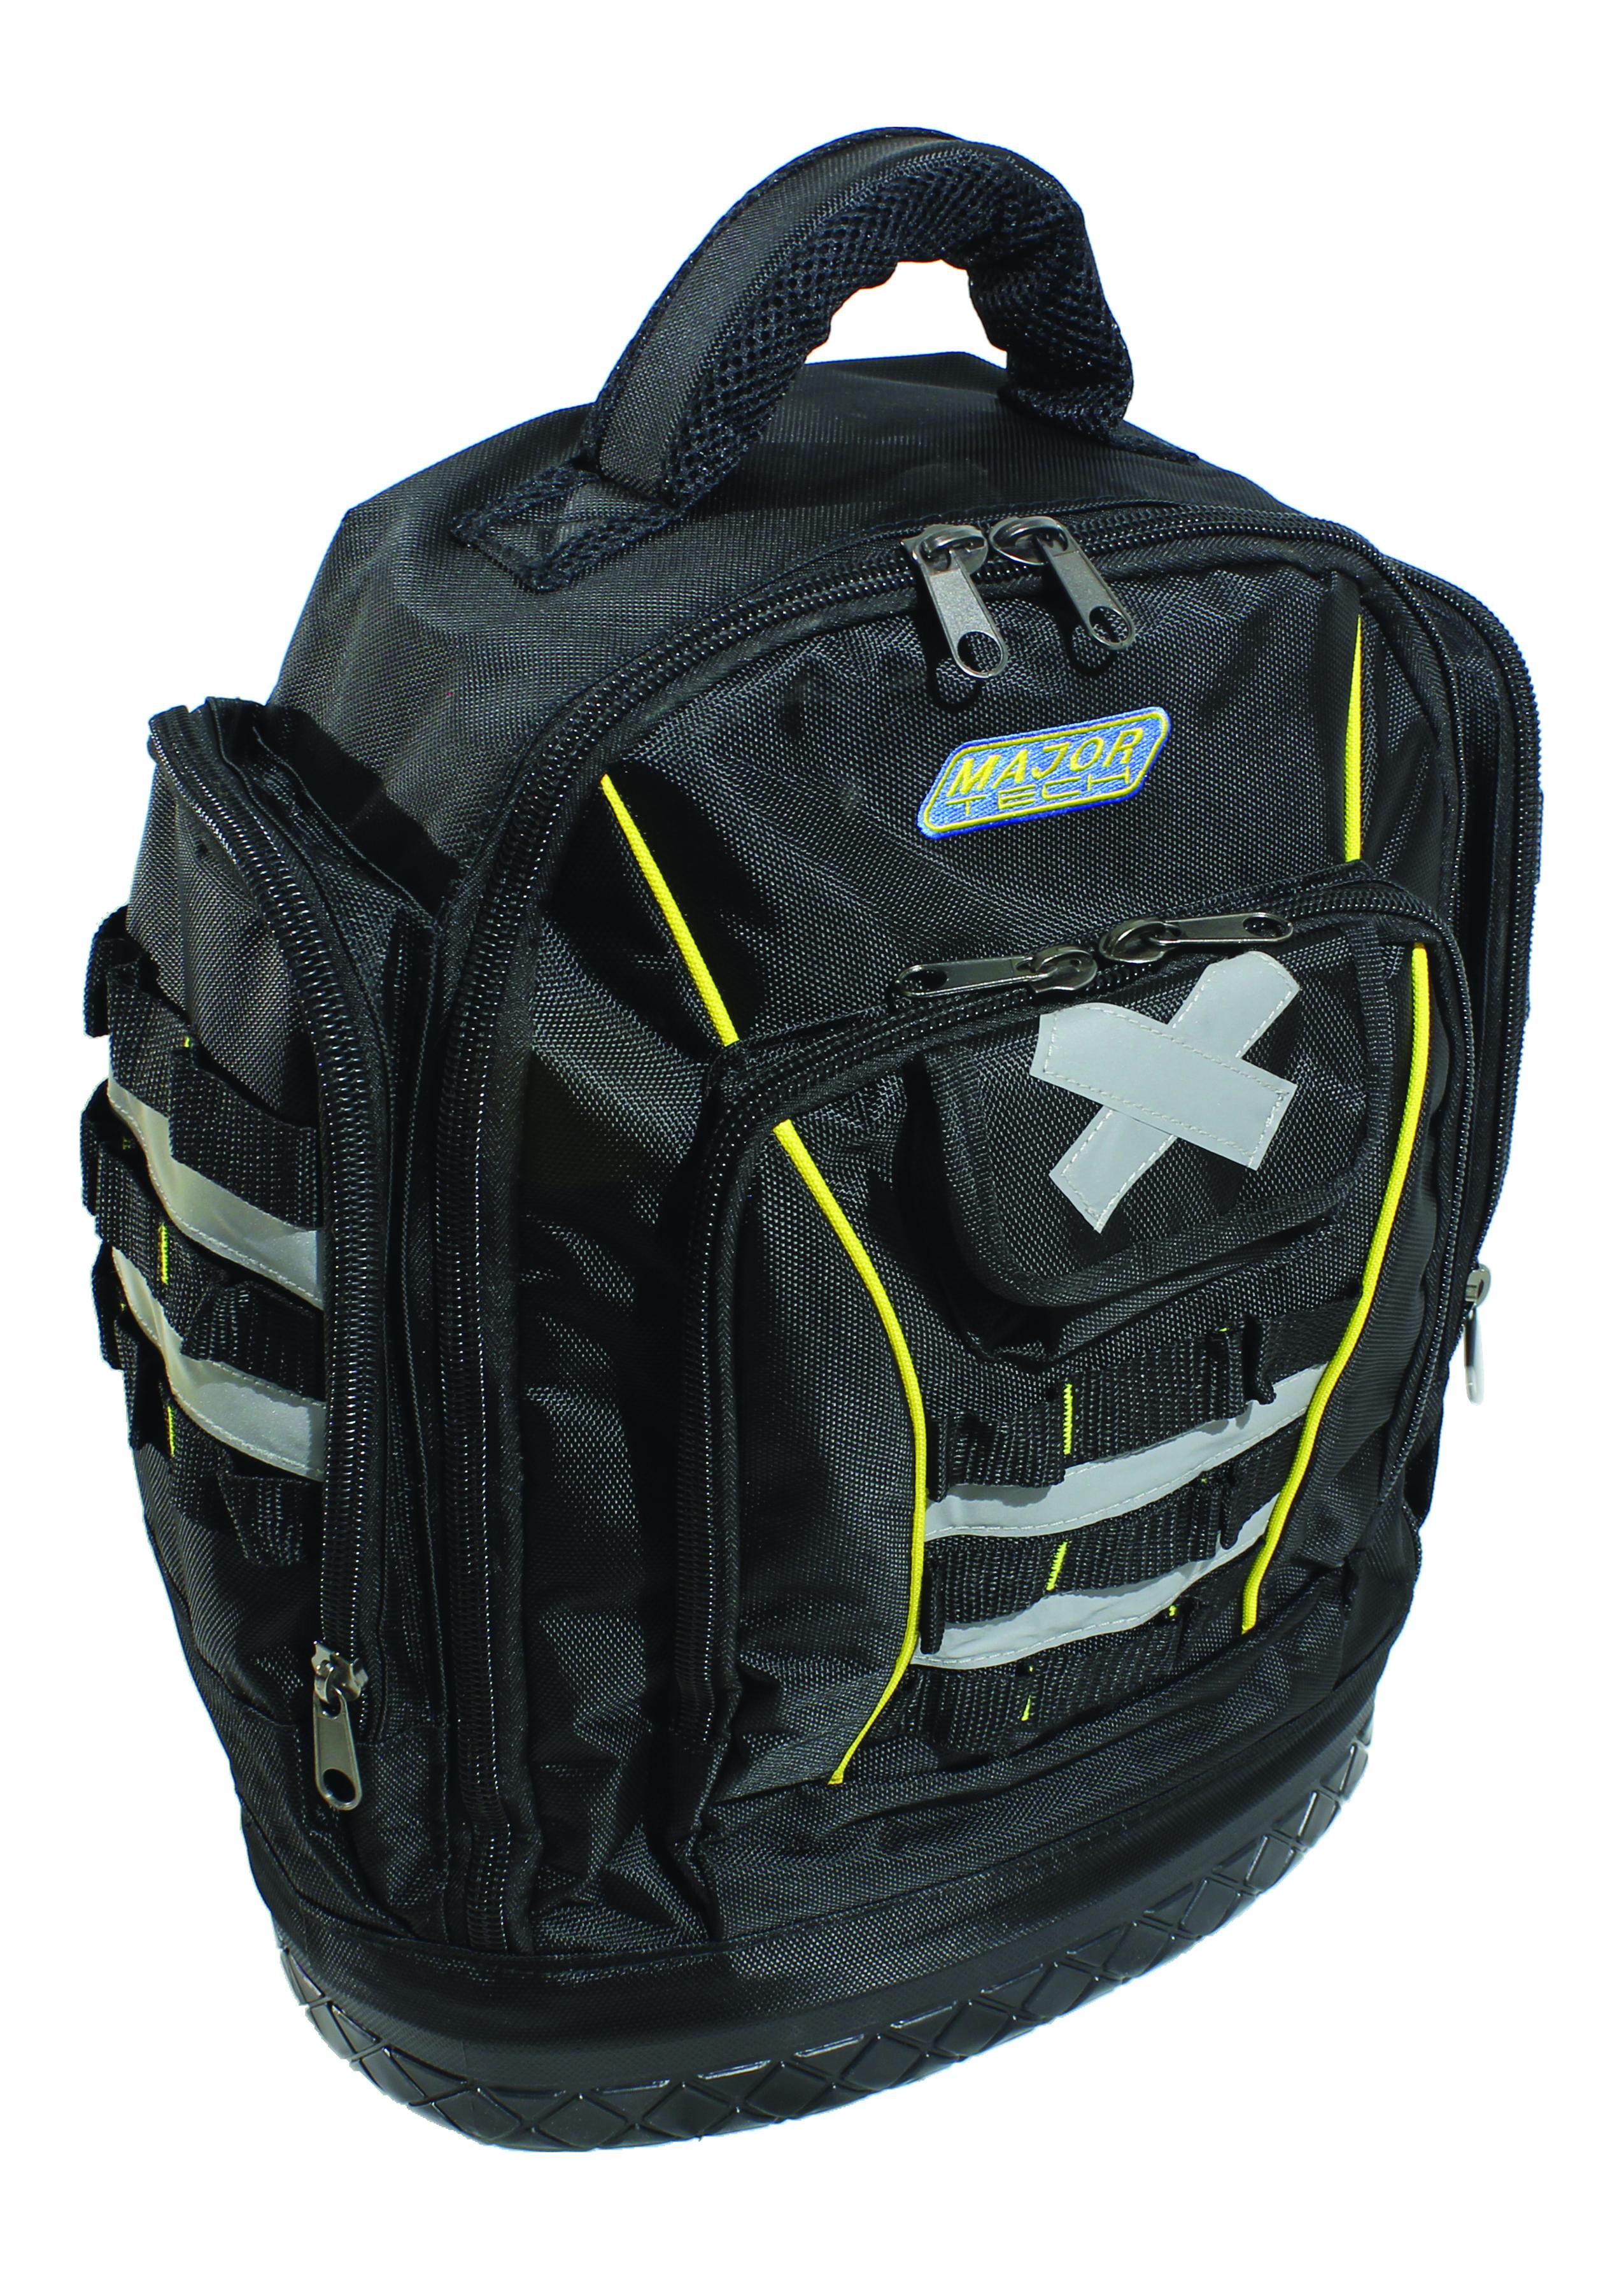 Tool Backpack (TBP5) - Major Tech